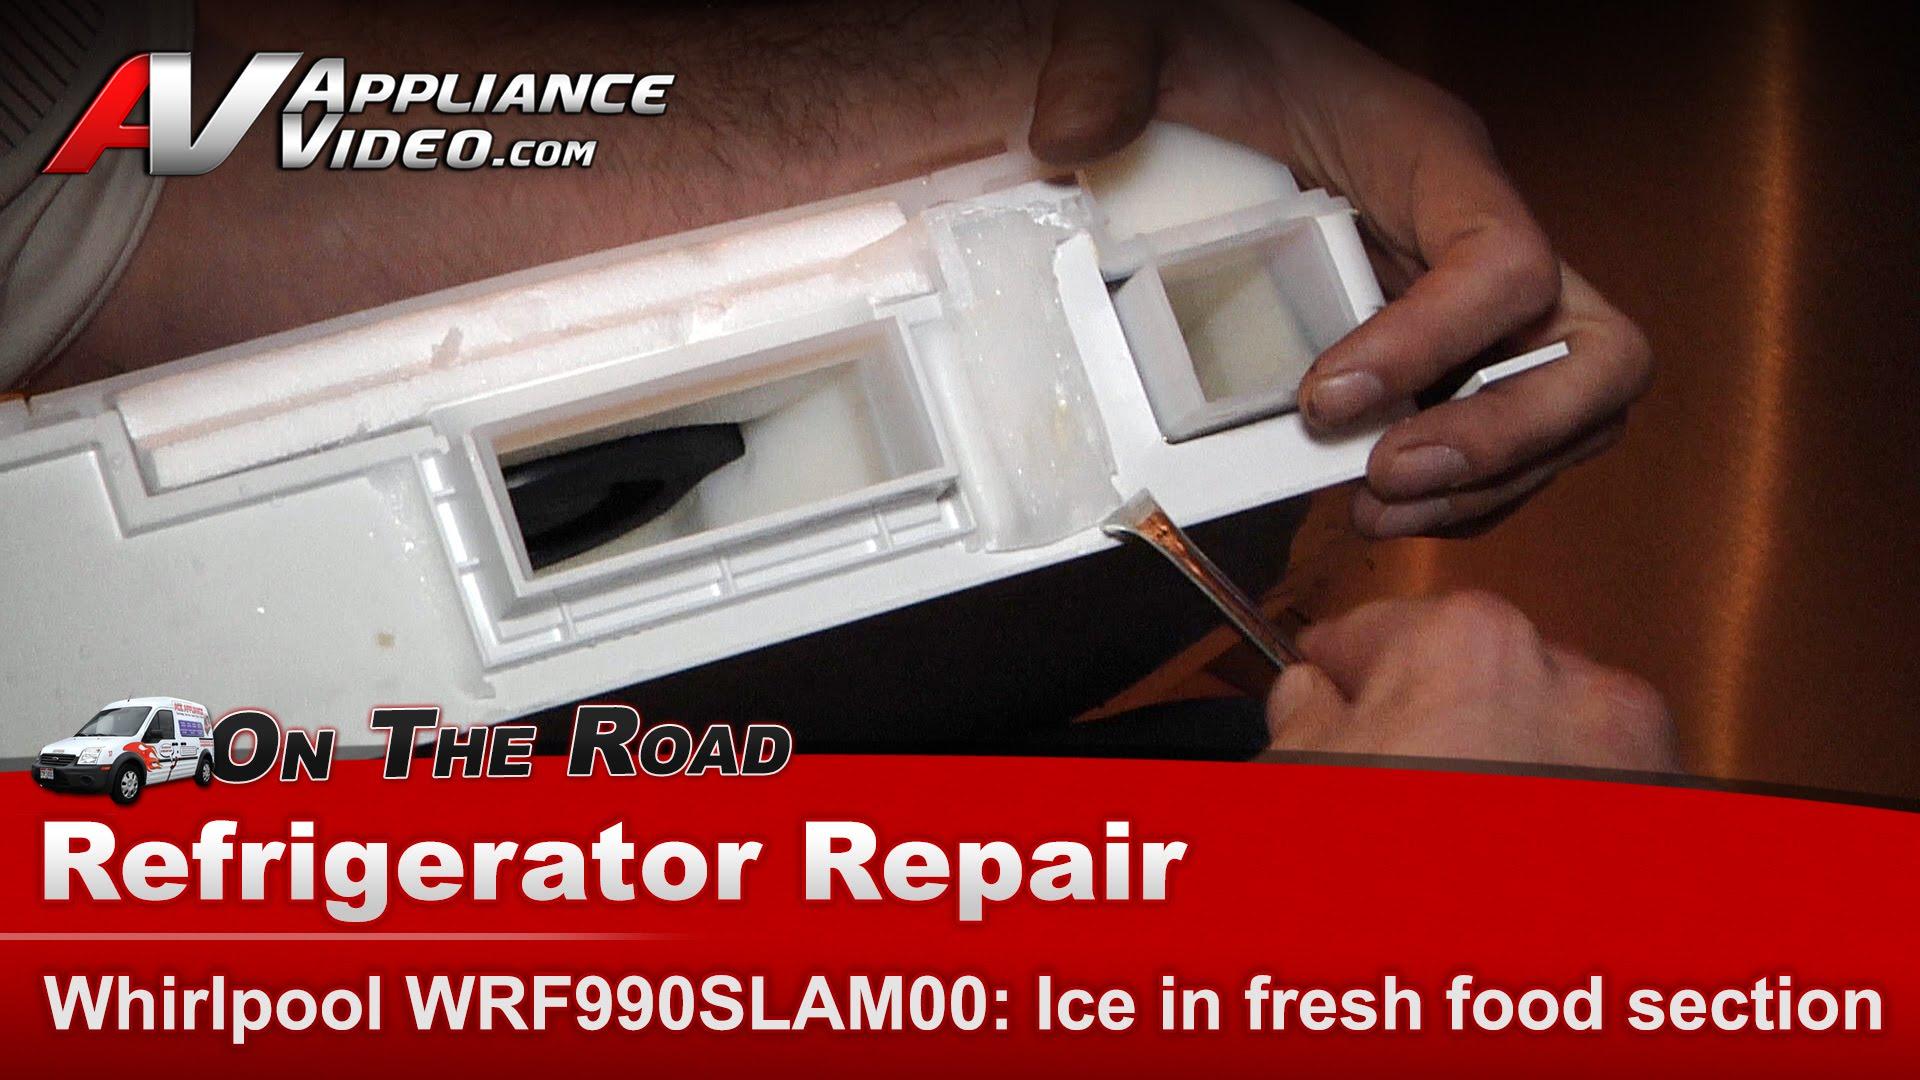 Whirlpool Refrigerator  Heater Fix Kit W10628737  Ice maker leaking on back wall  Appliance Video